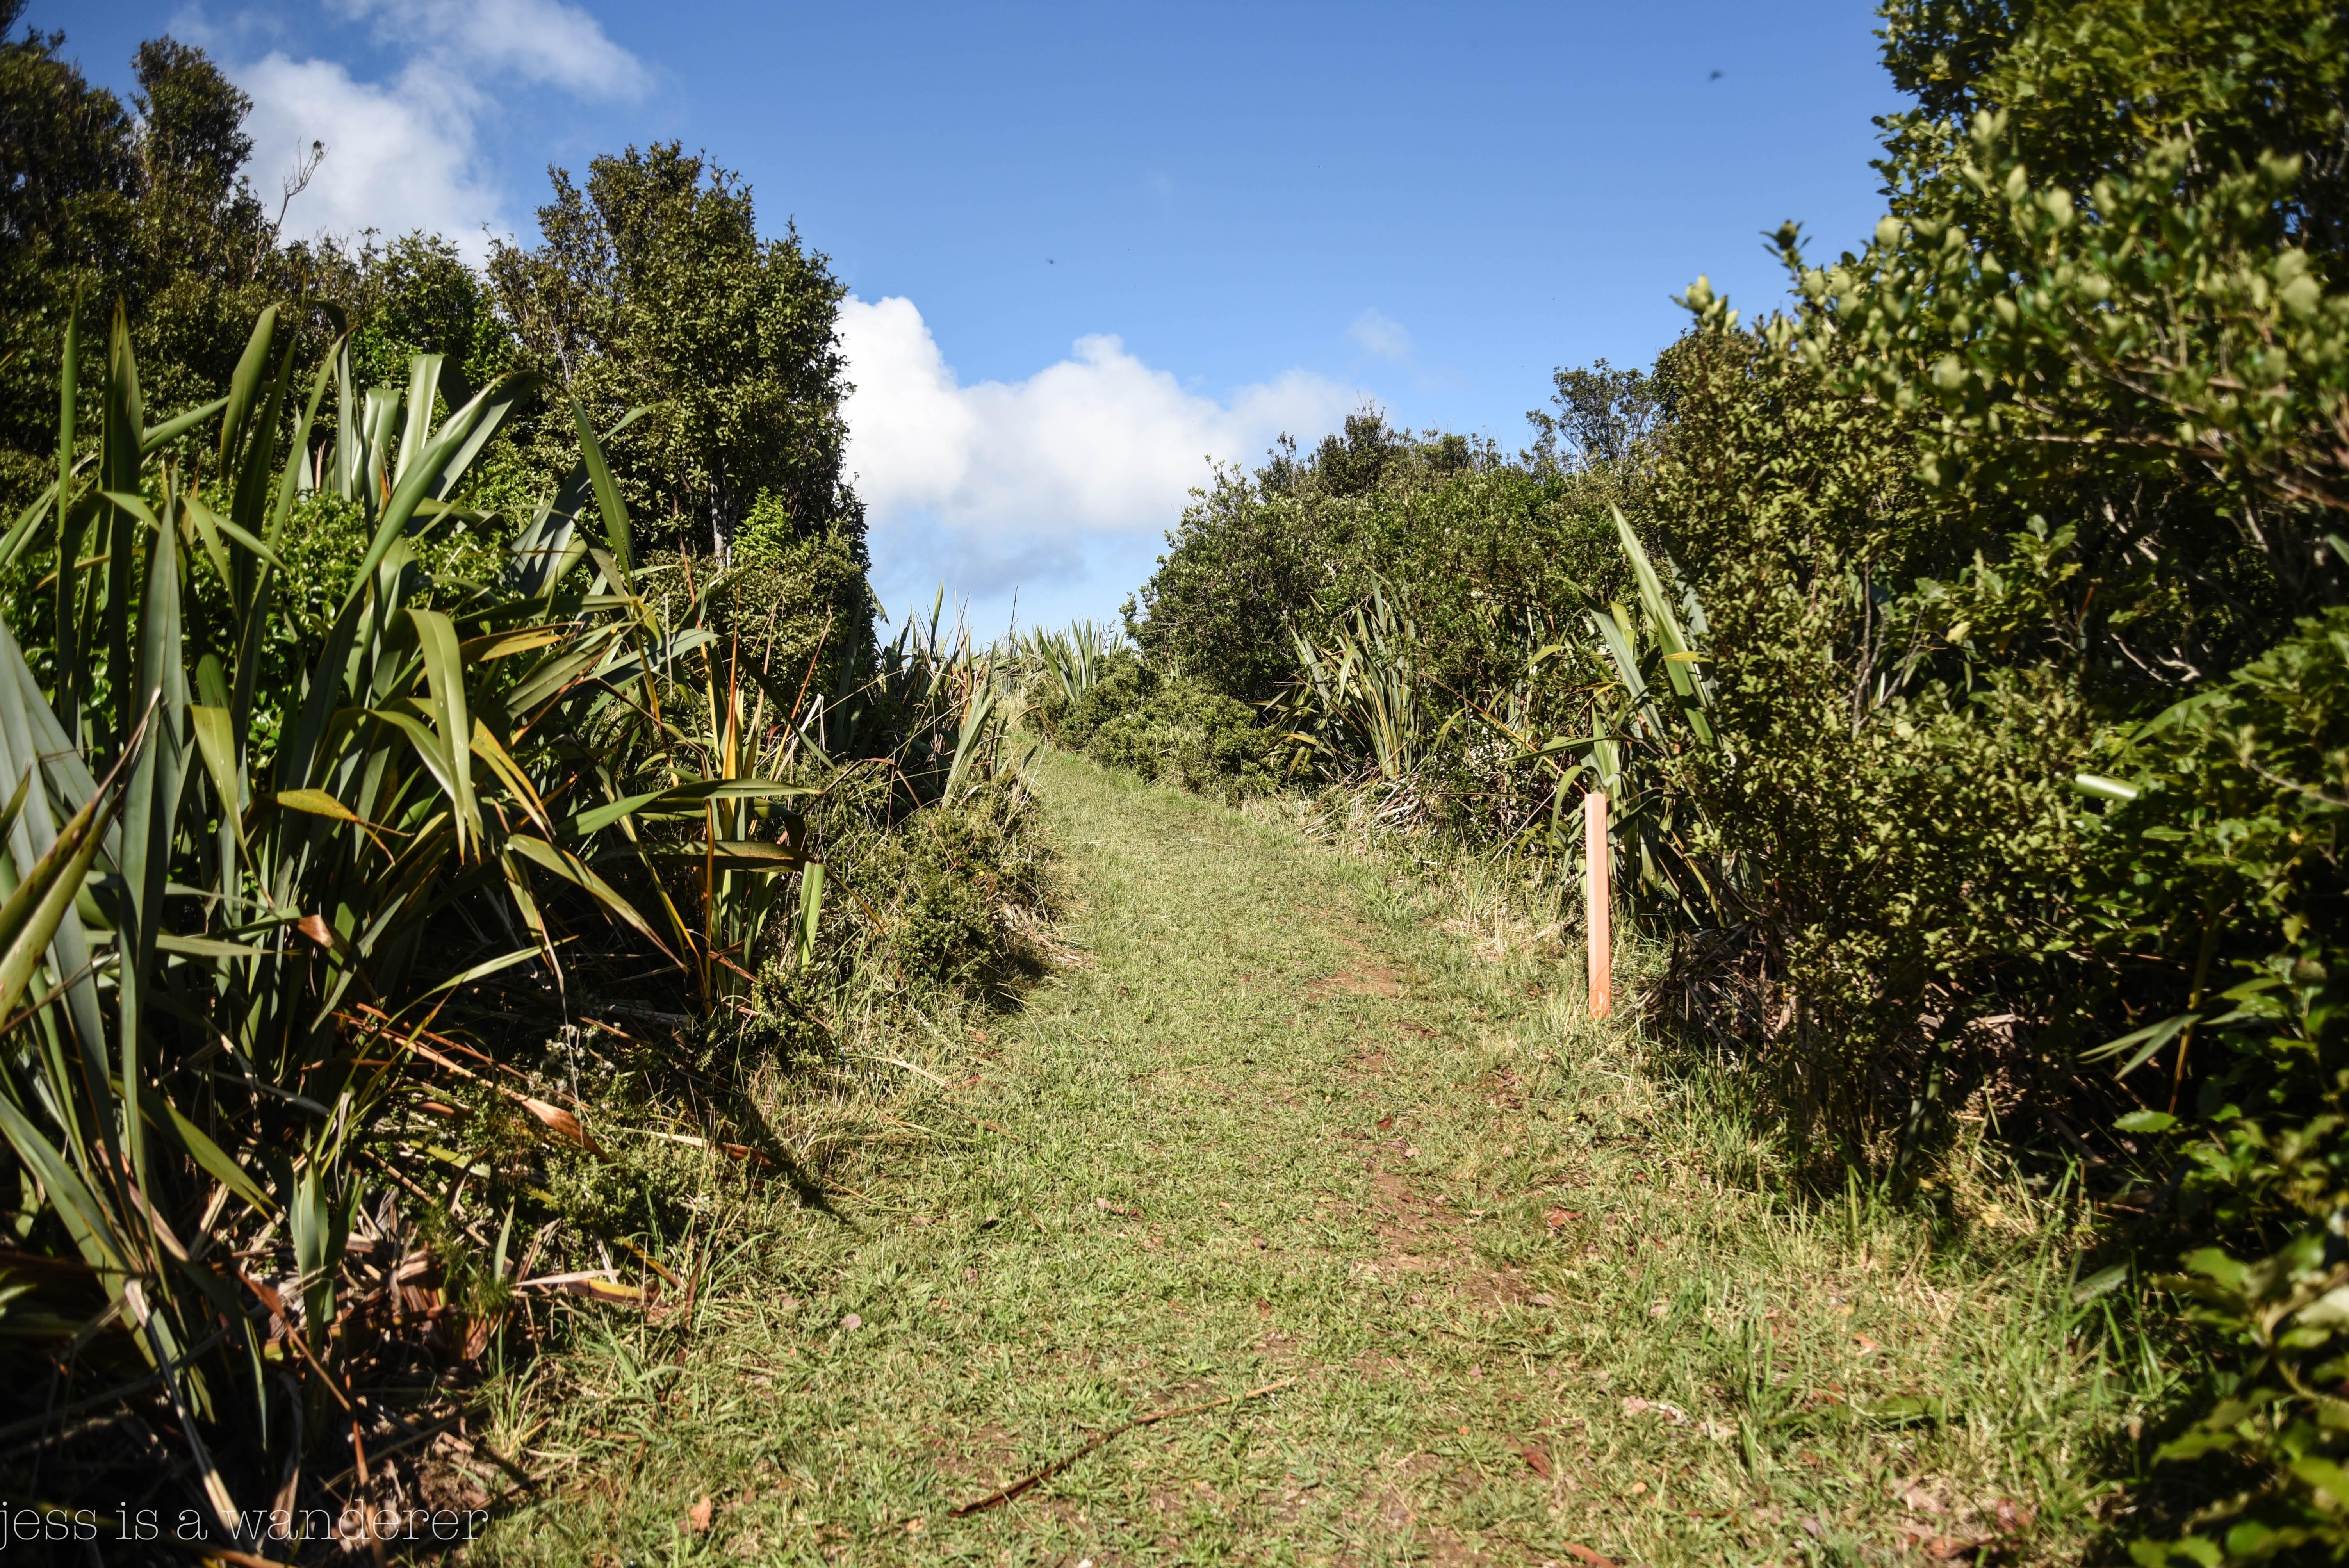 Jess is a Wanderer Hikes Maunganui Bluff